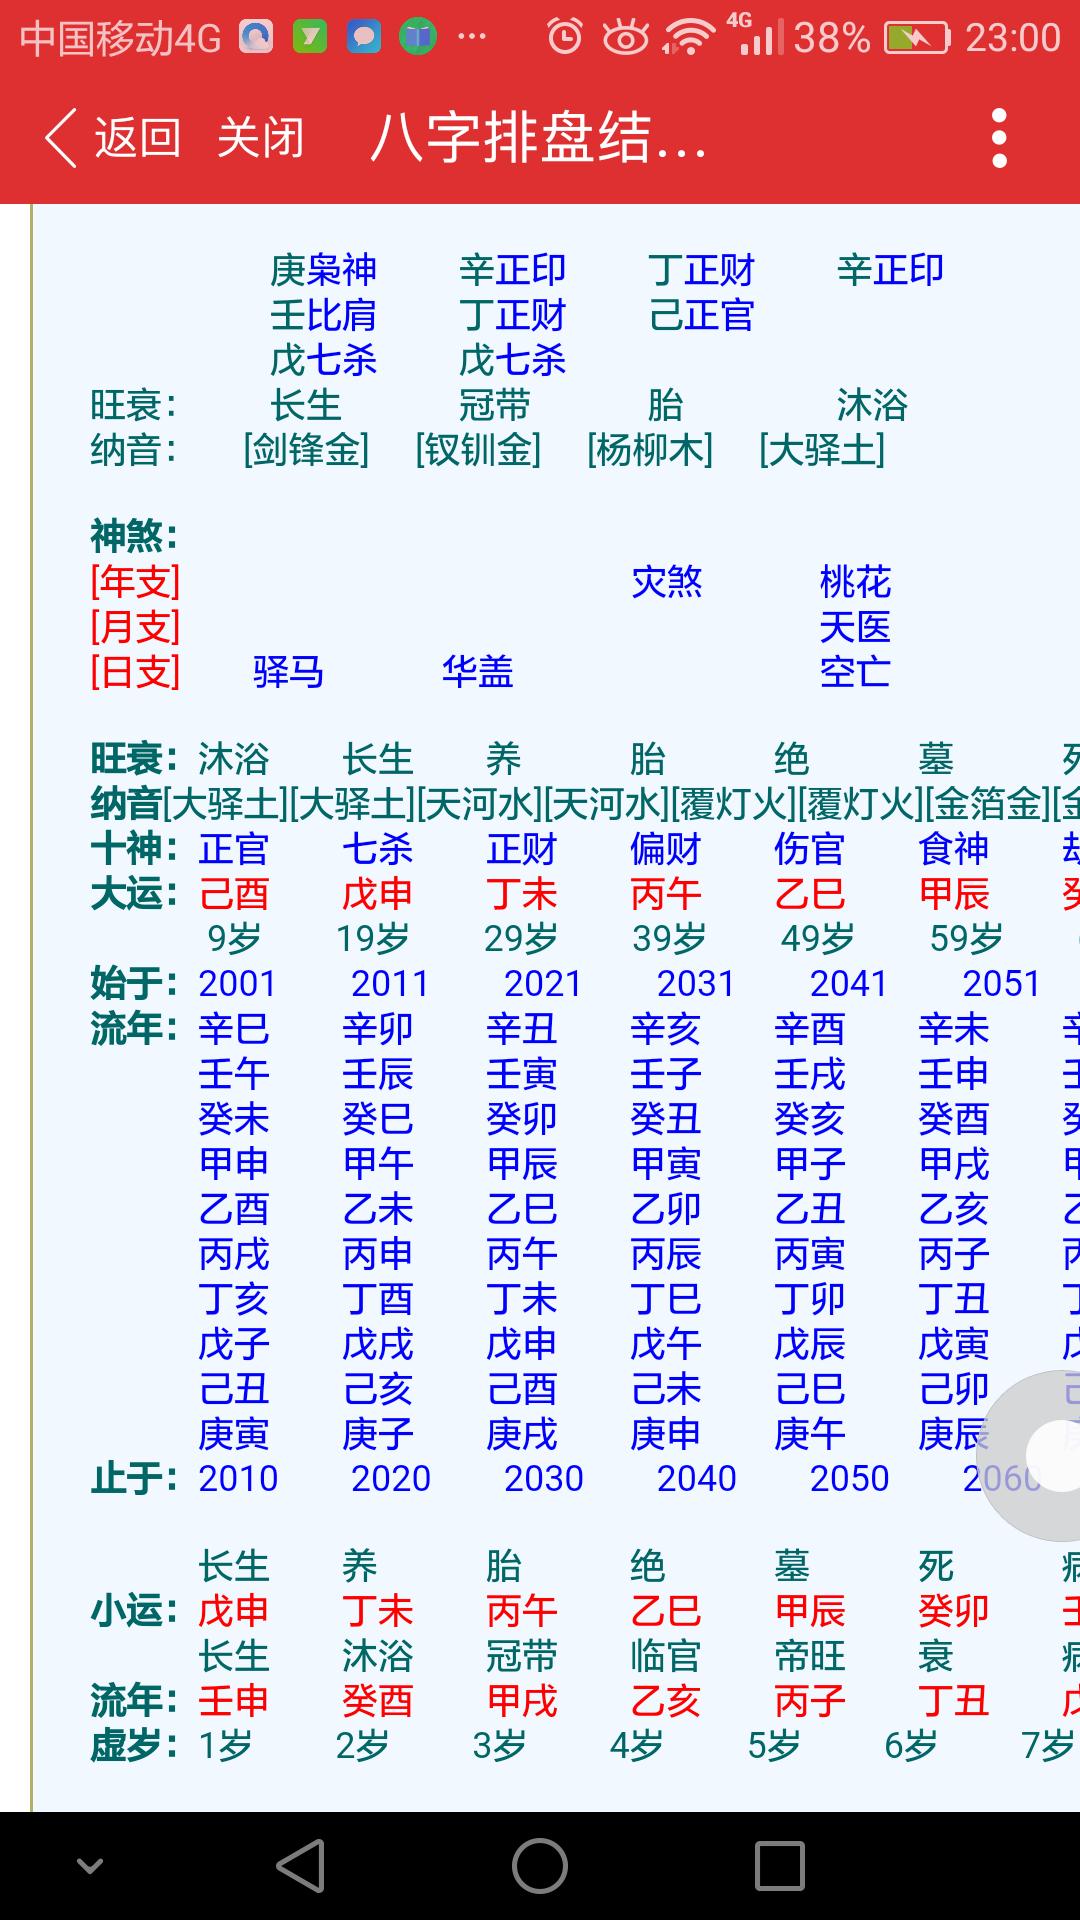 Screenshot_2019-03-17-23-00-17.png